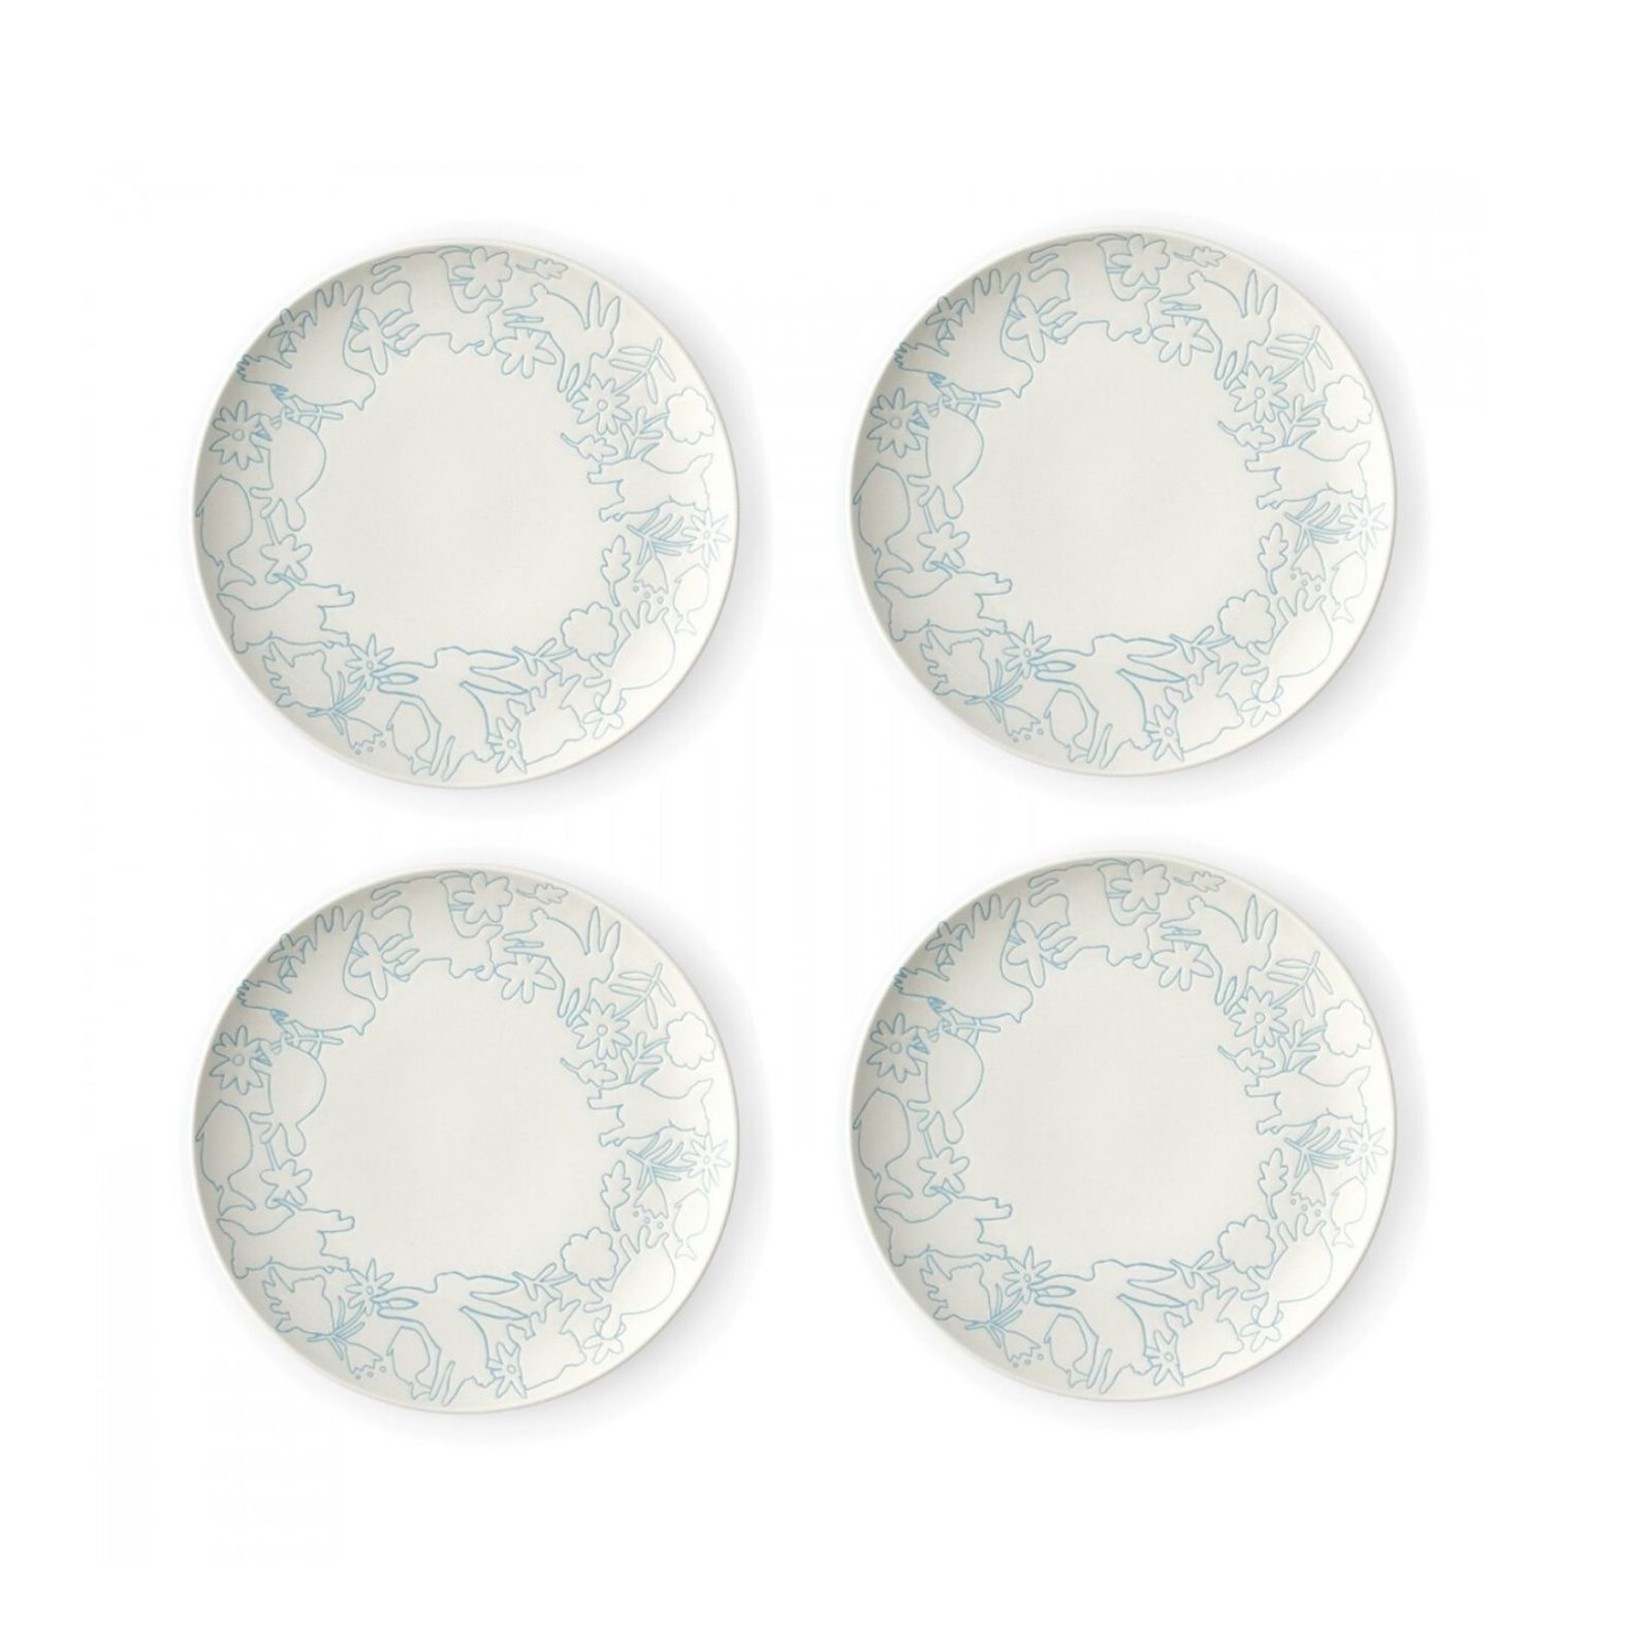 "Polar Blue 8"" Accents Plates Set of 4"